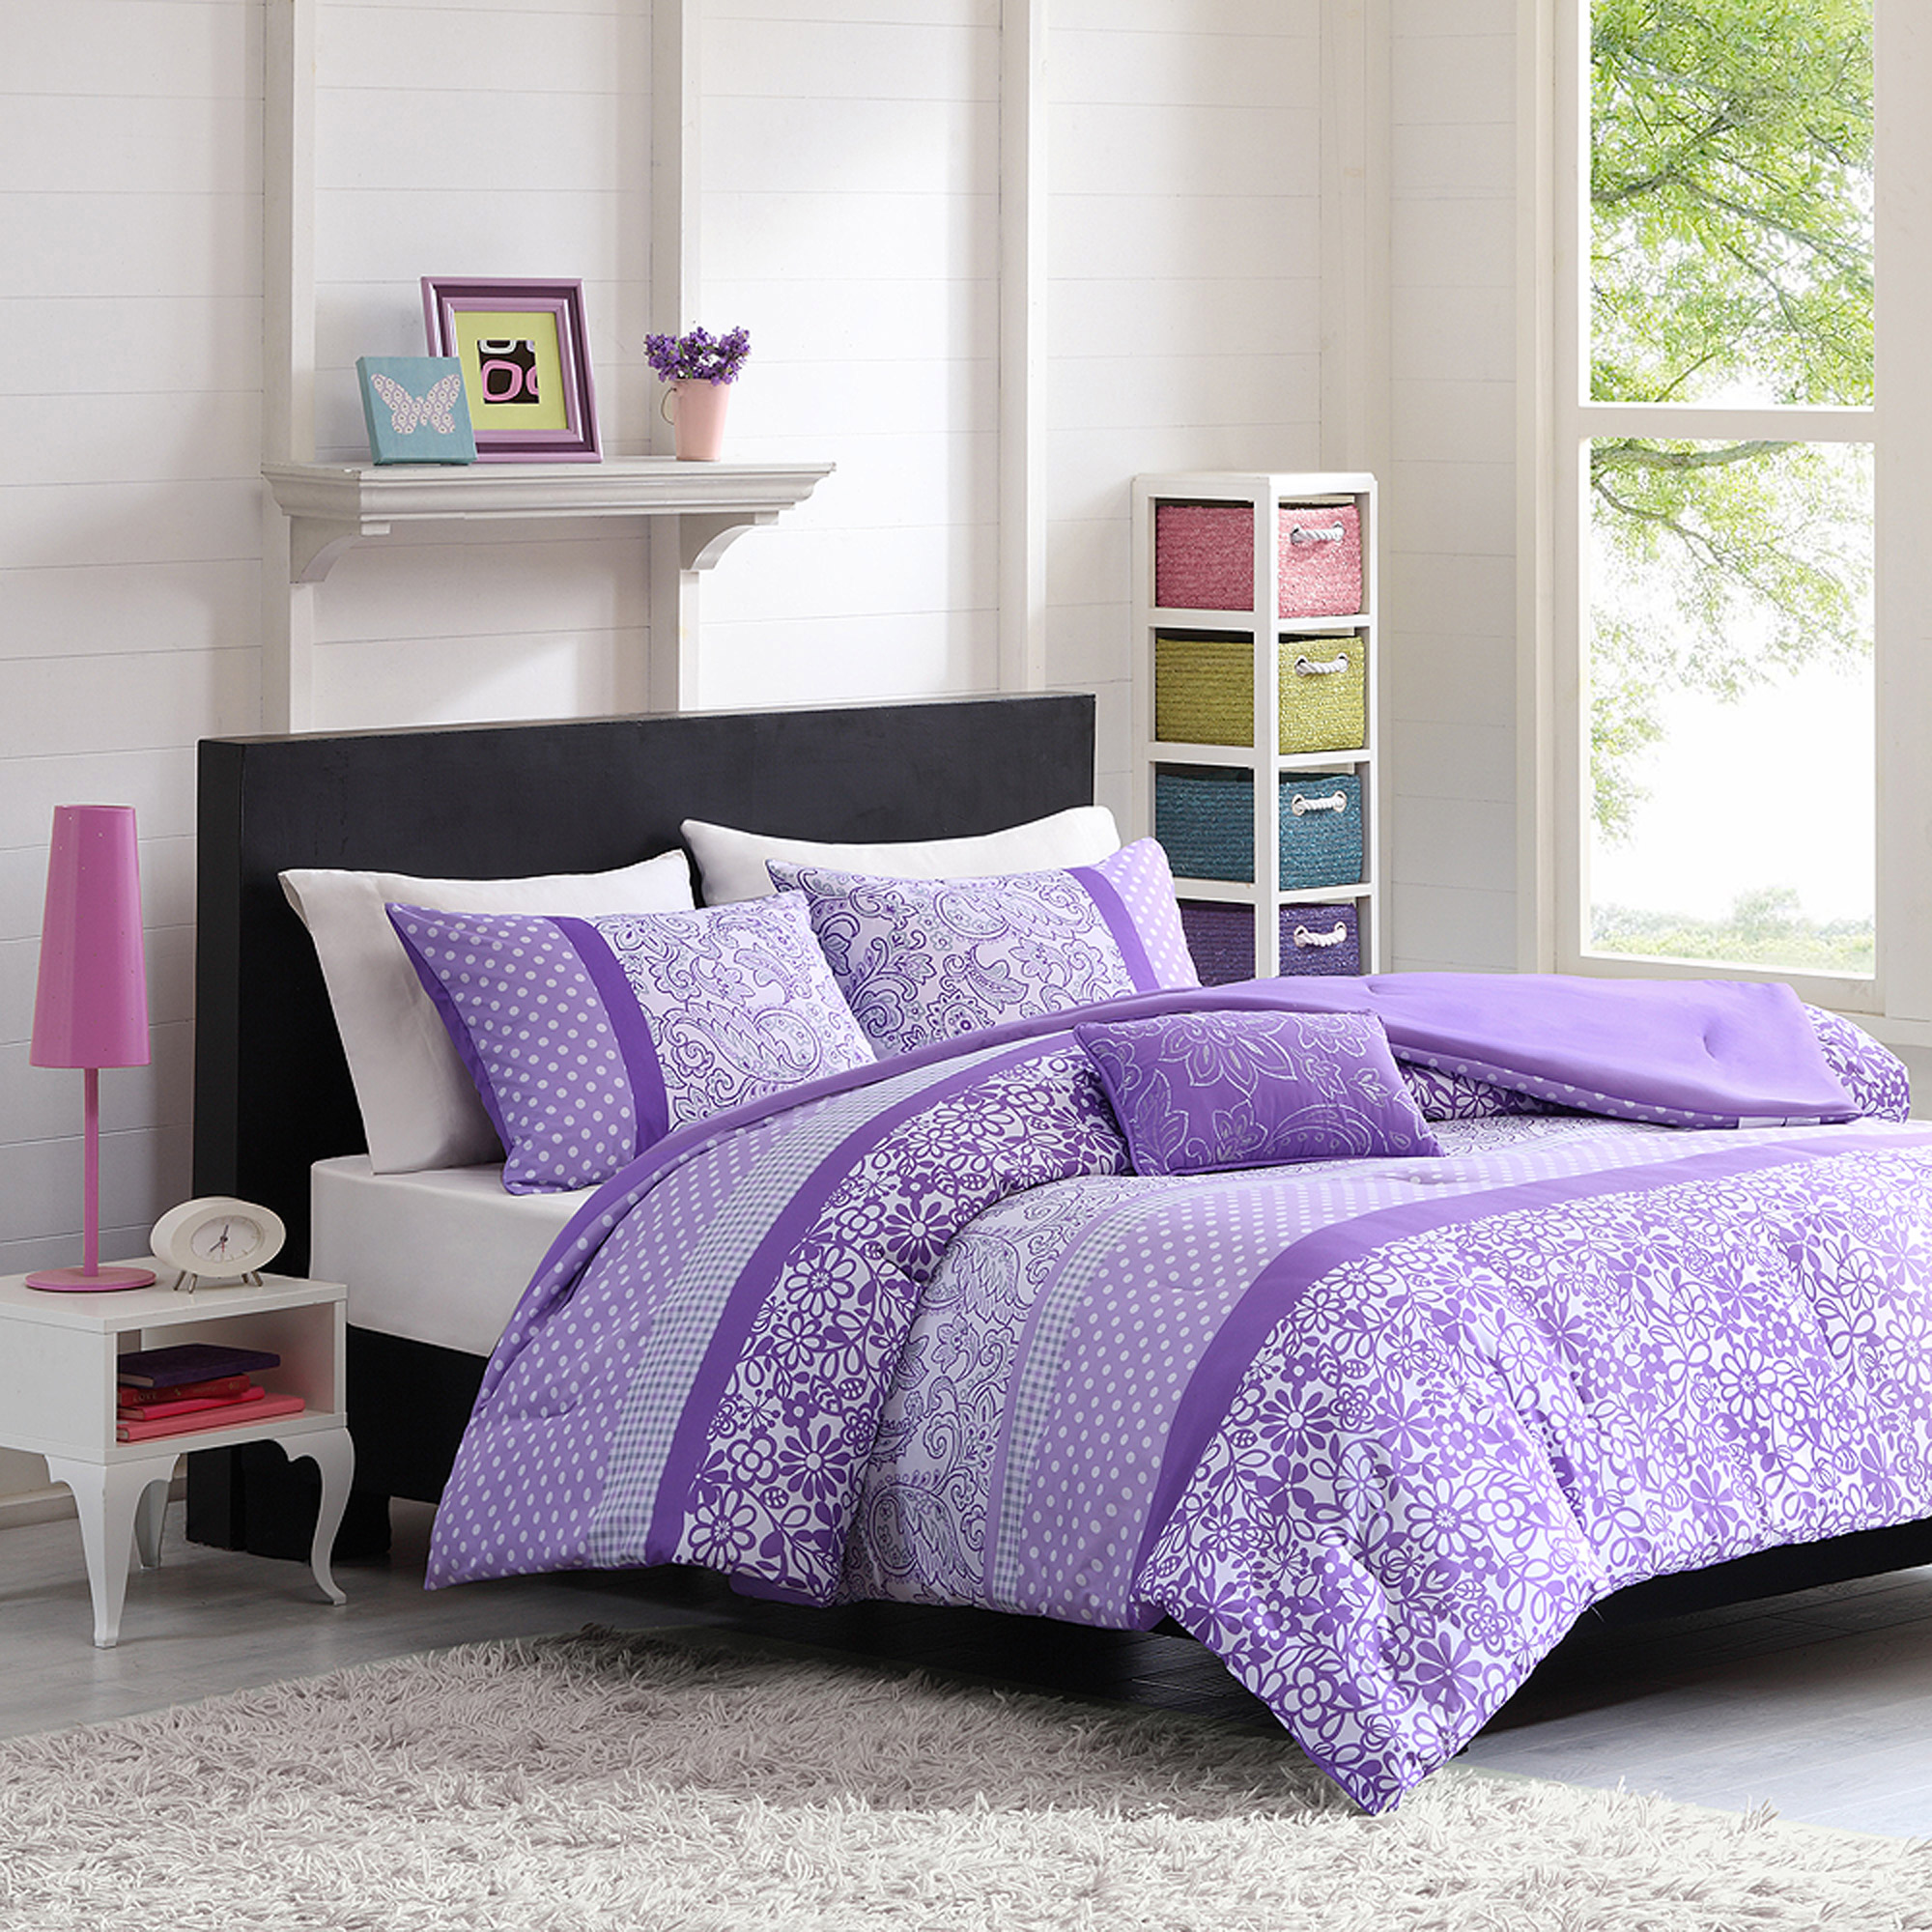 Home Essence Apartment Angela Bedding Comforter Set